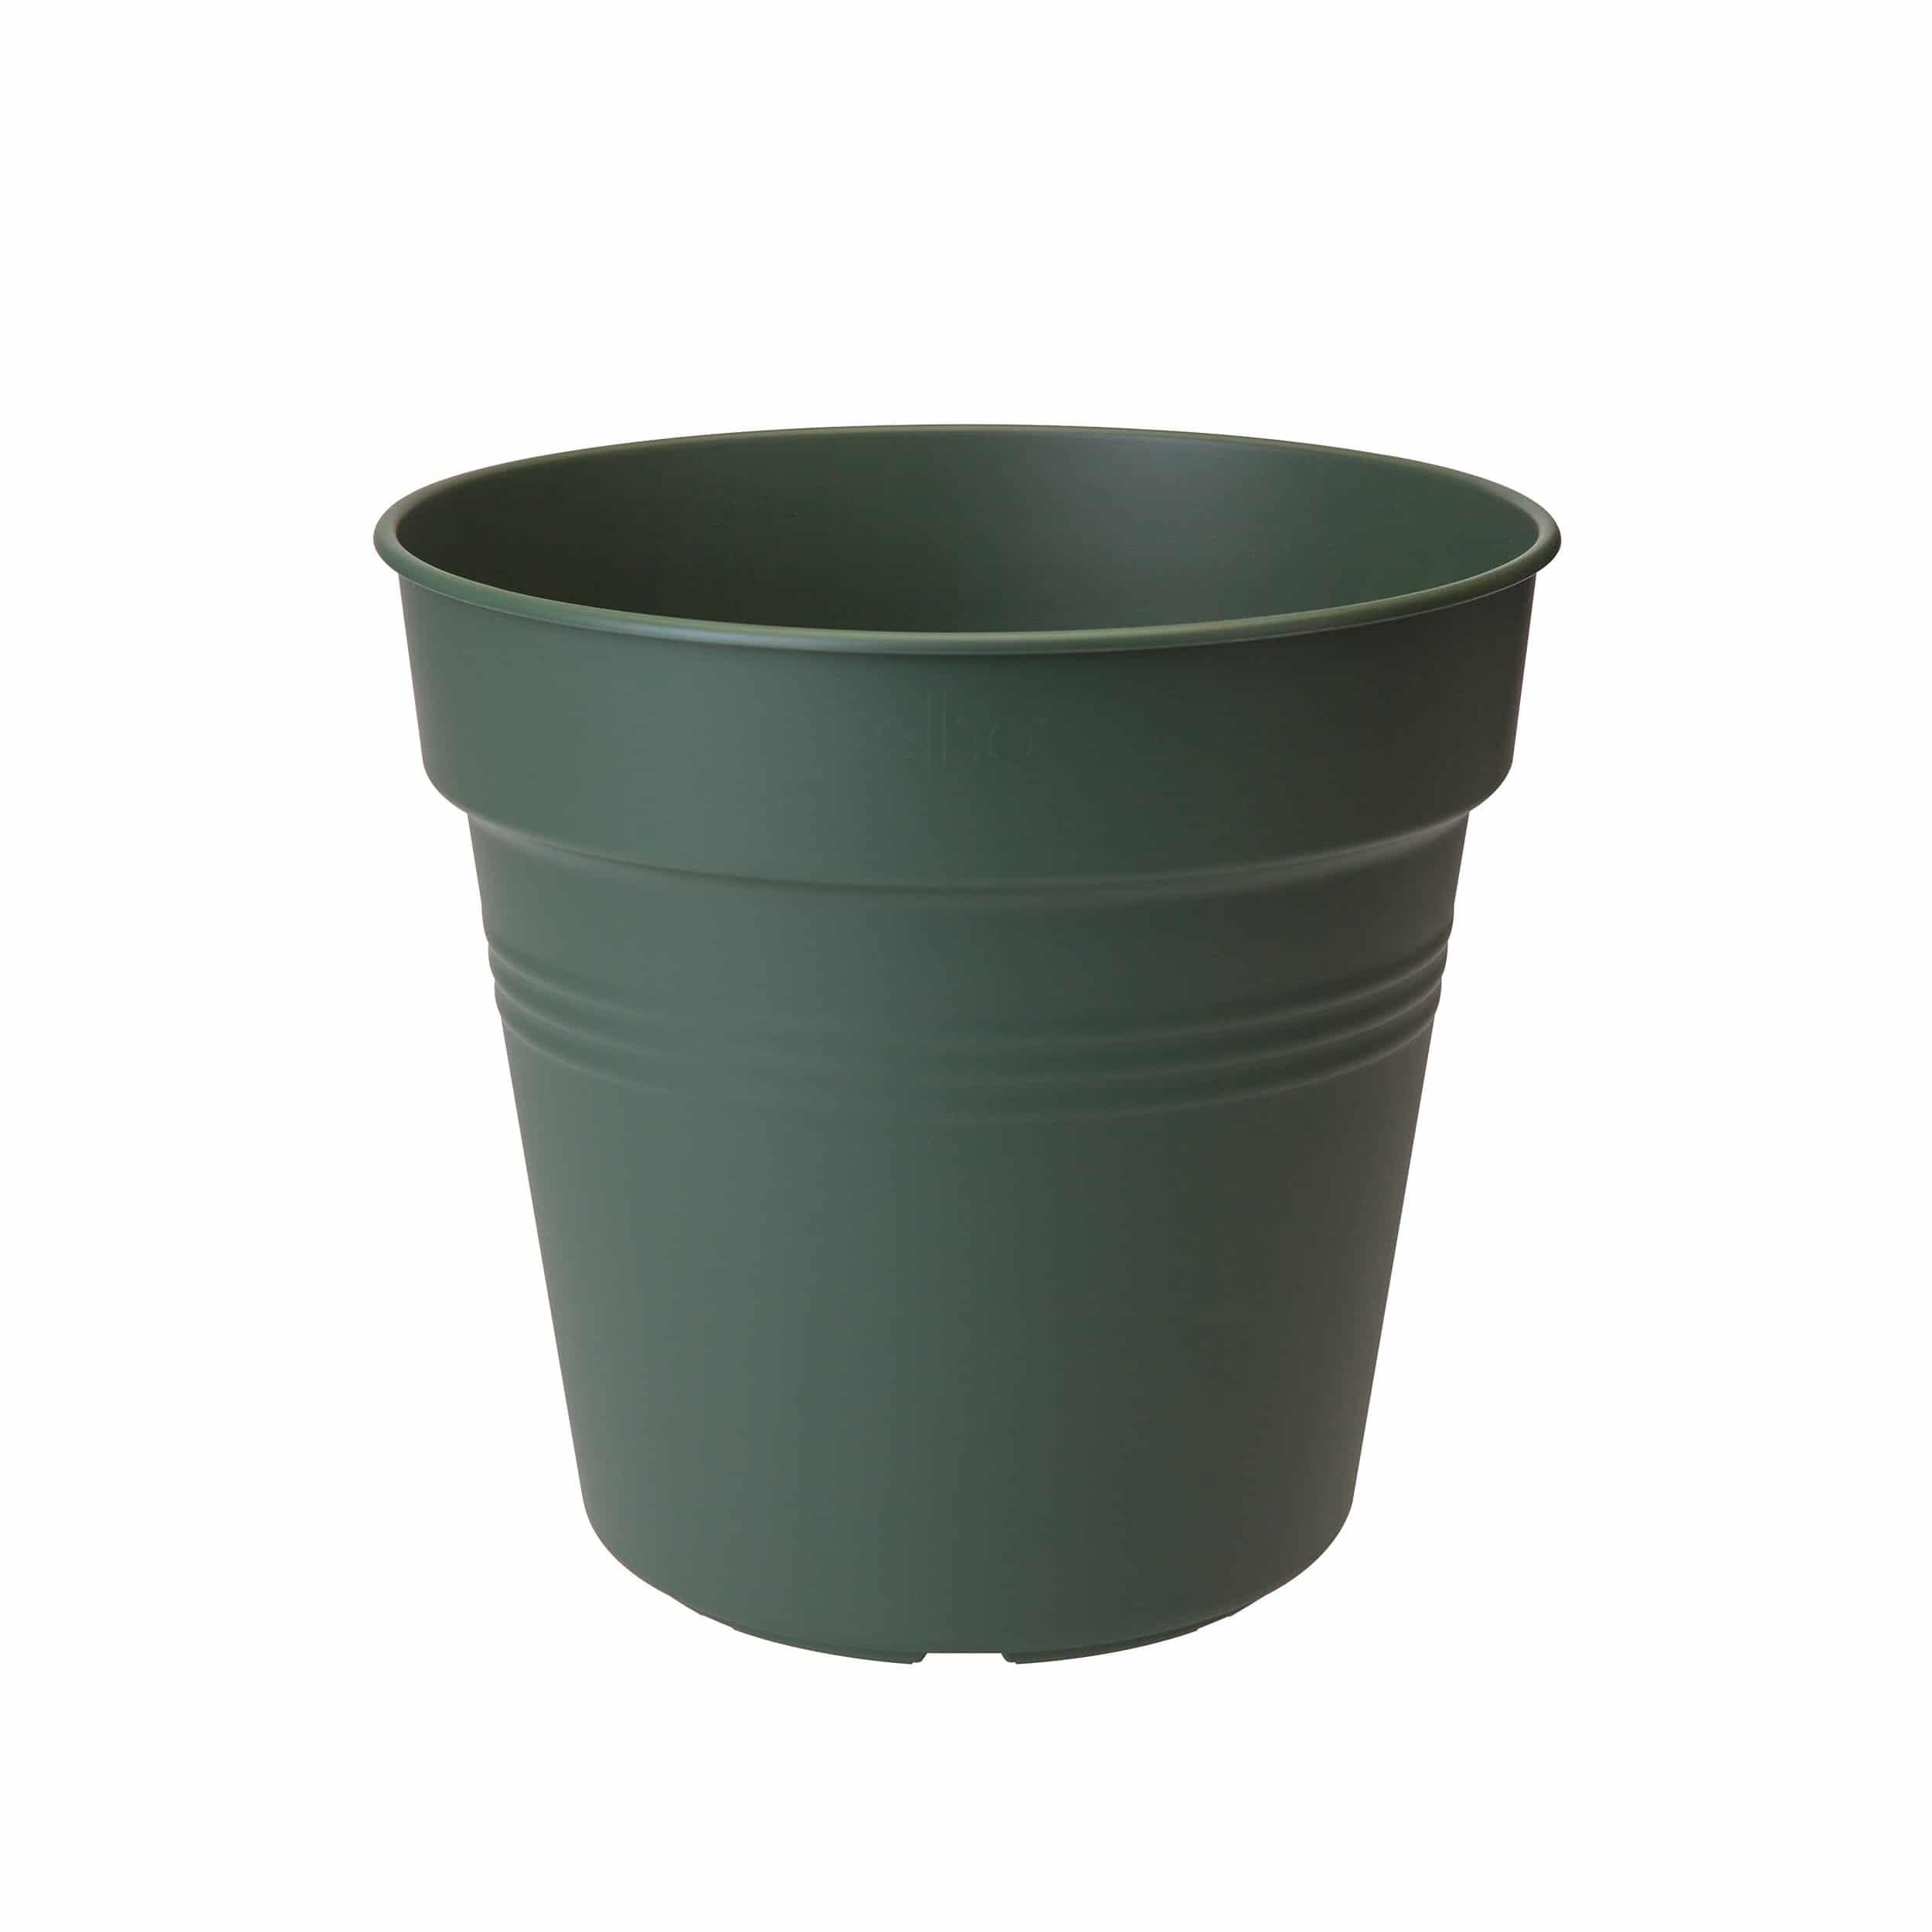 Pflanztopf Green Basics D30cm laubgrün